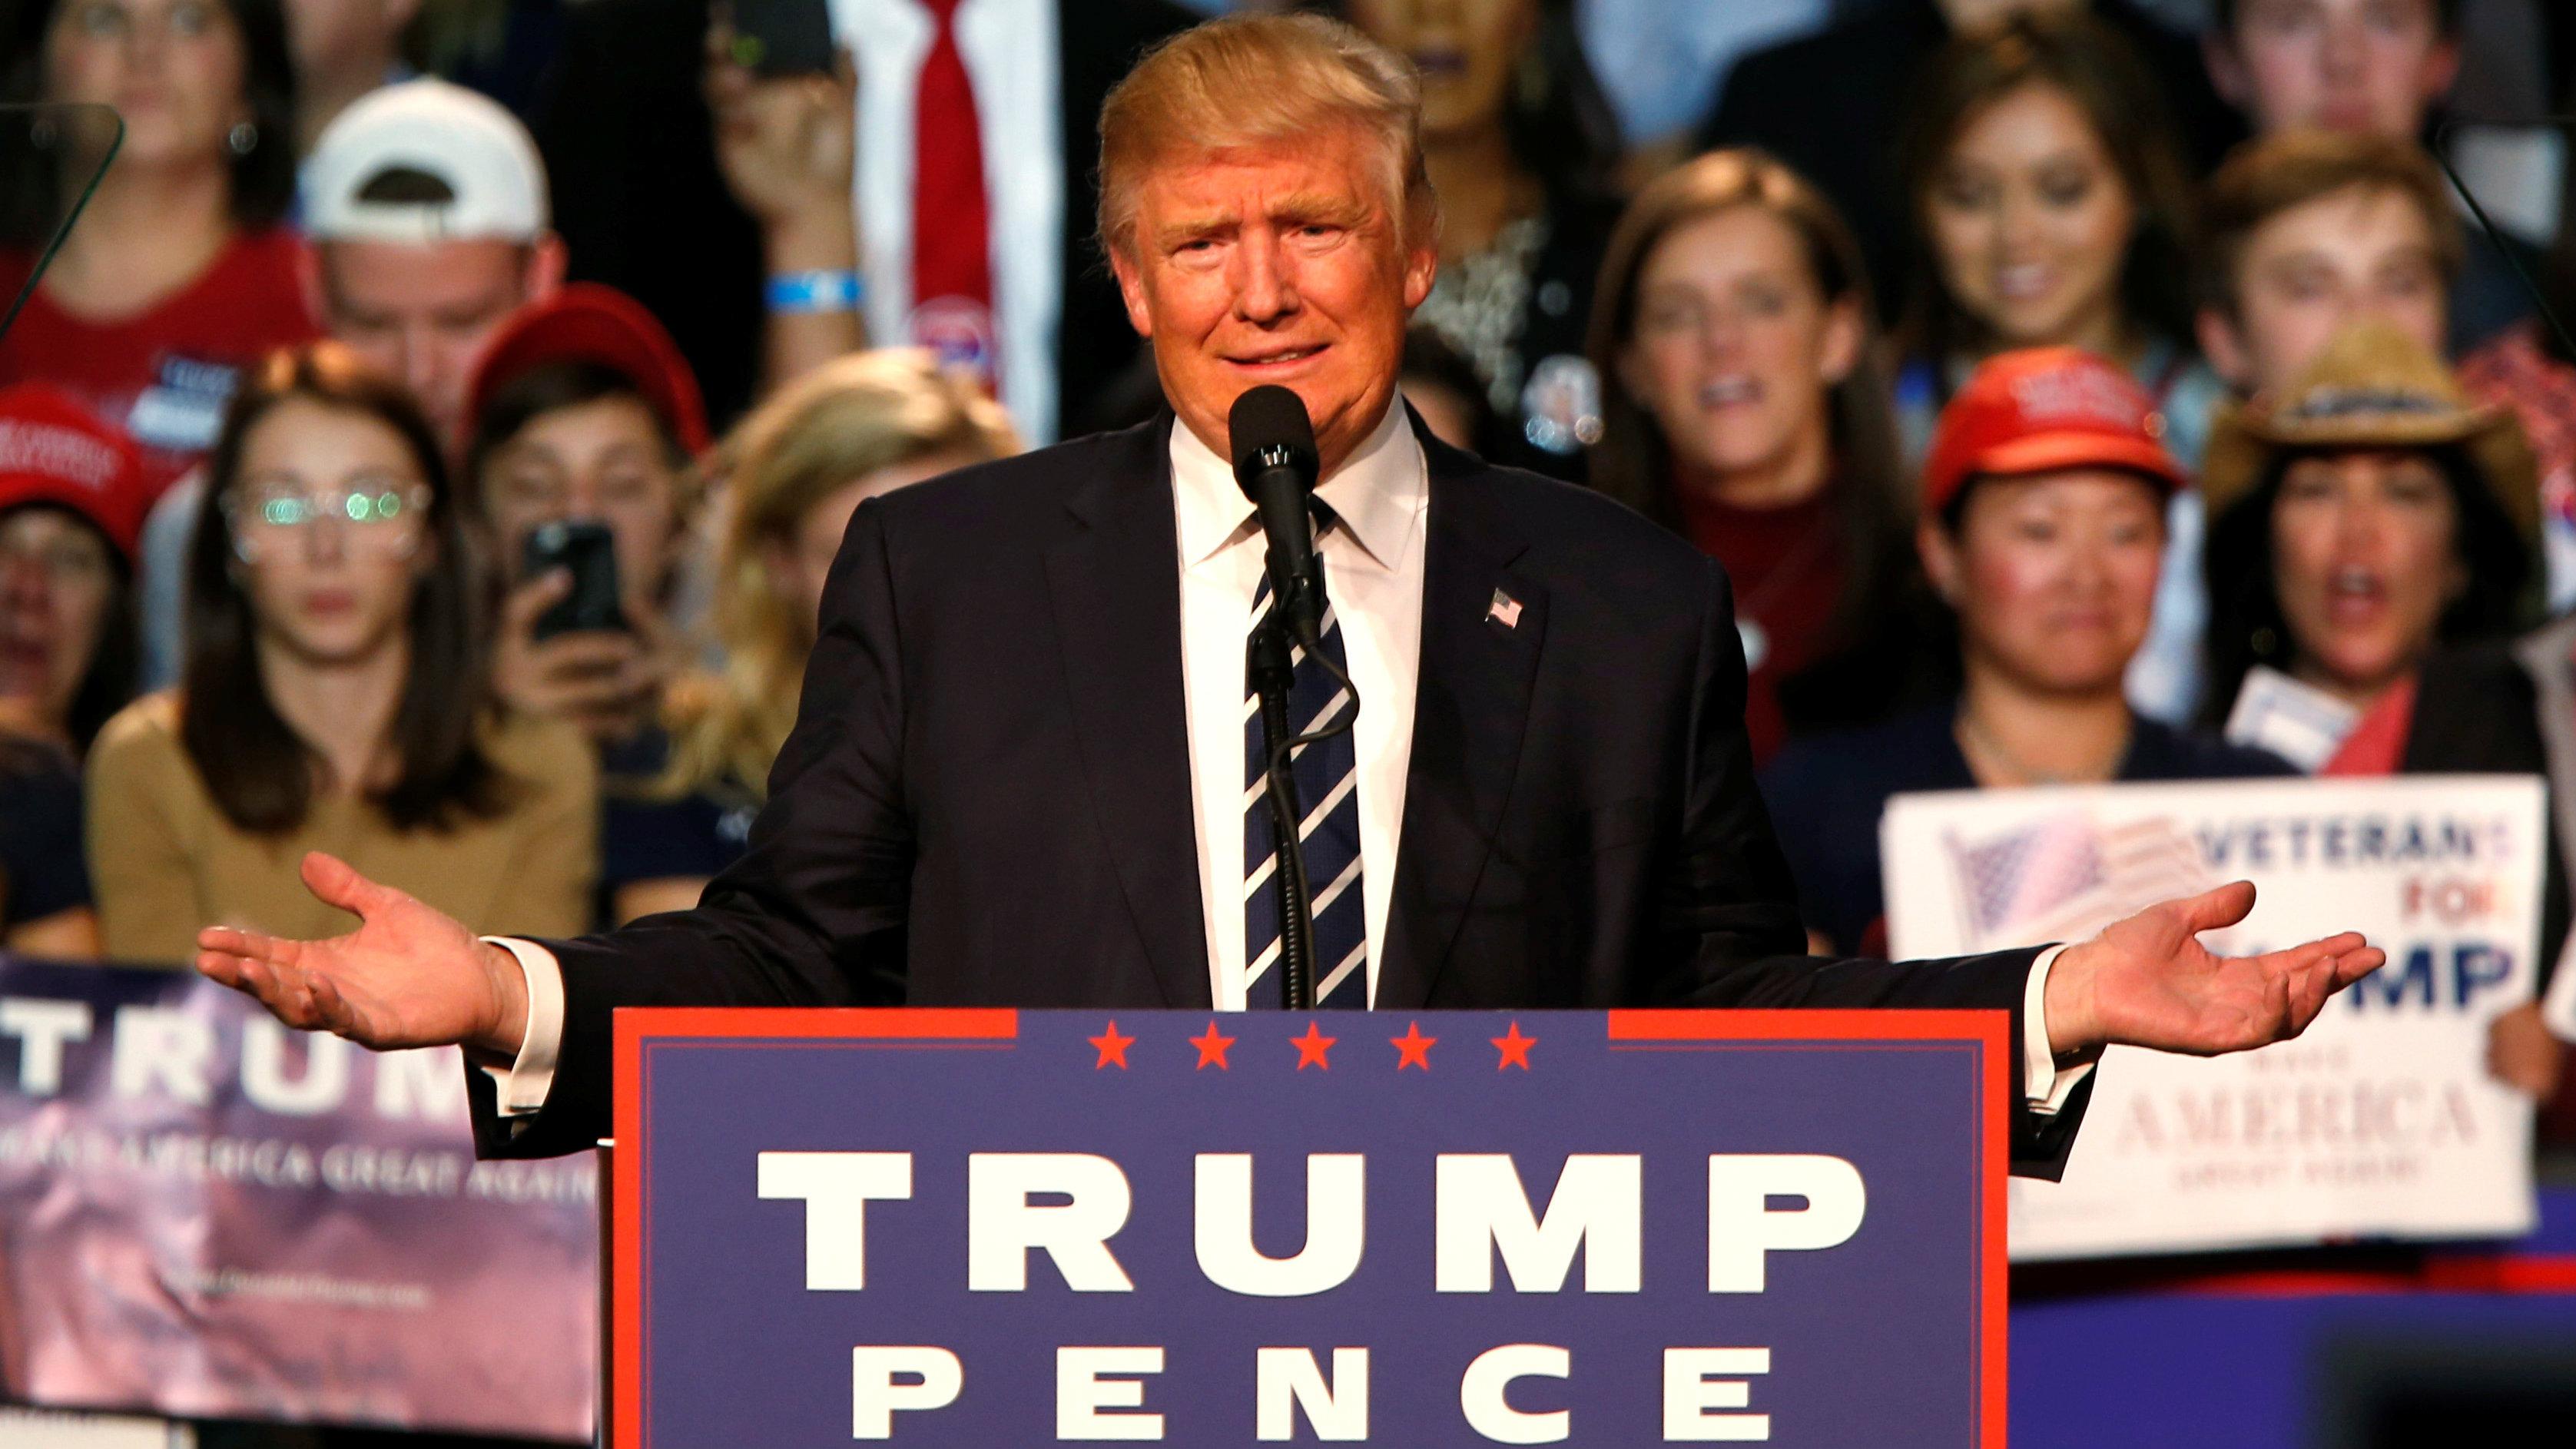 U.S. Republican presidential nominee Donald Trump speaks at his final campaign event at the Devos Place in Grand Rapids, Michigan, U.S. November 8, 2016